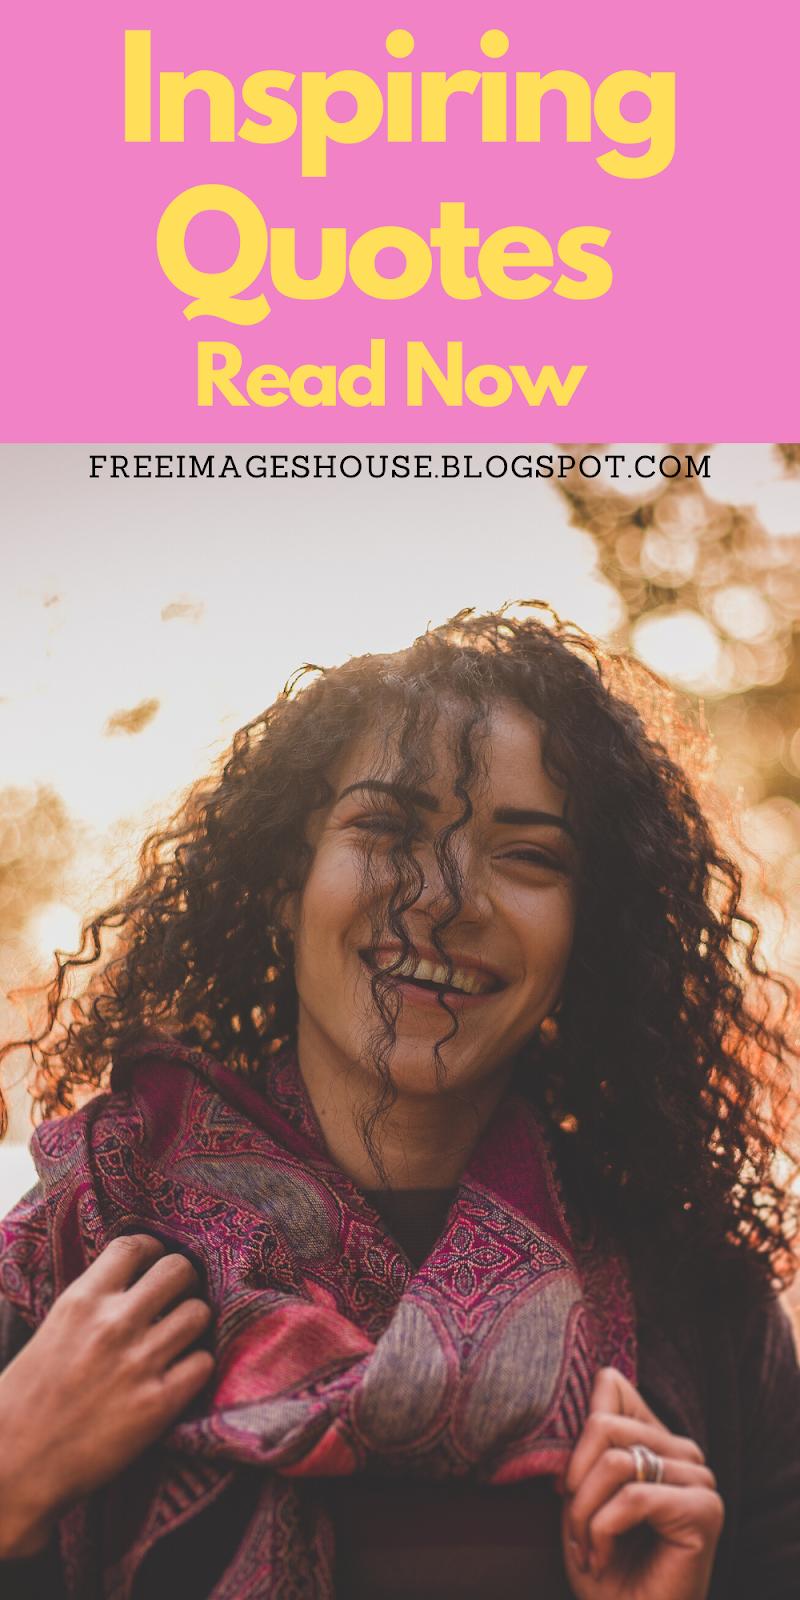 Inspiring Quotes - Freeimageshouse